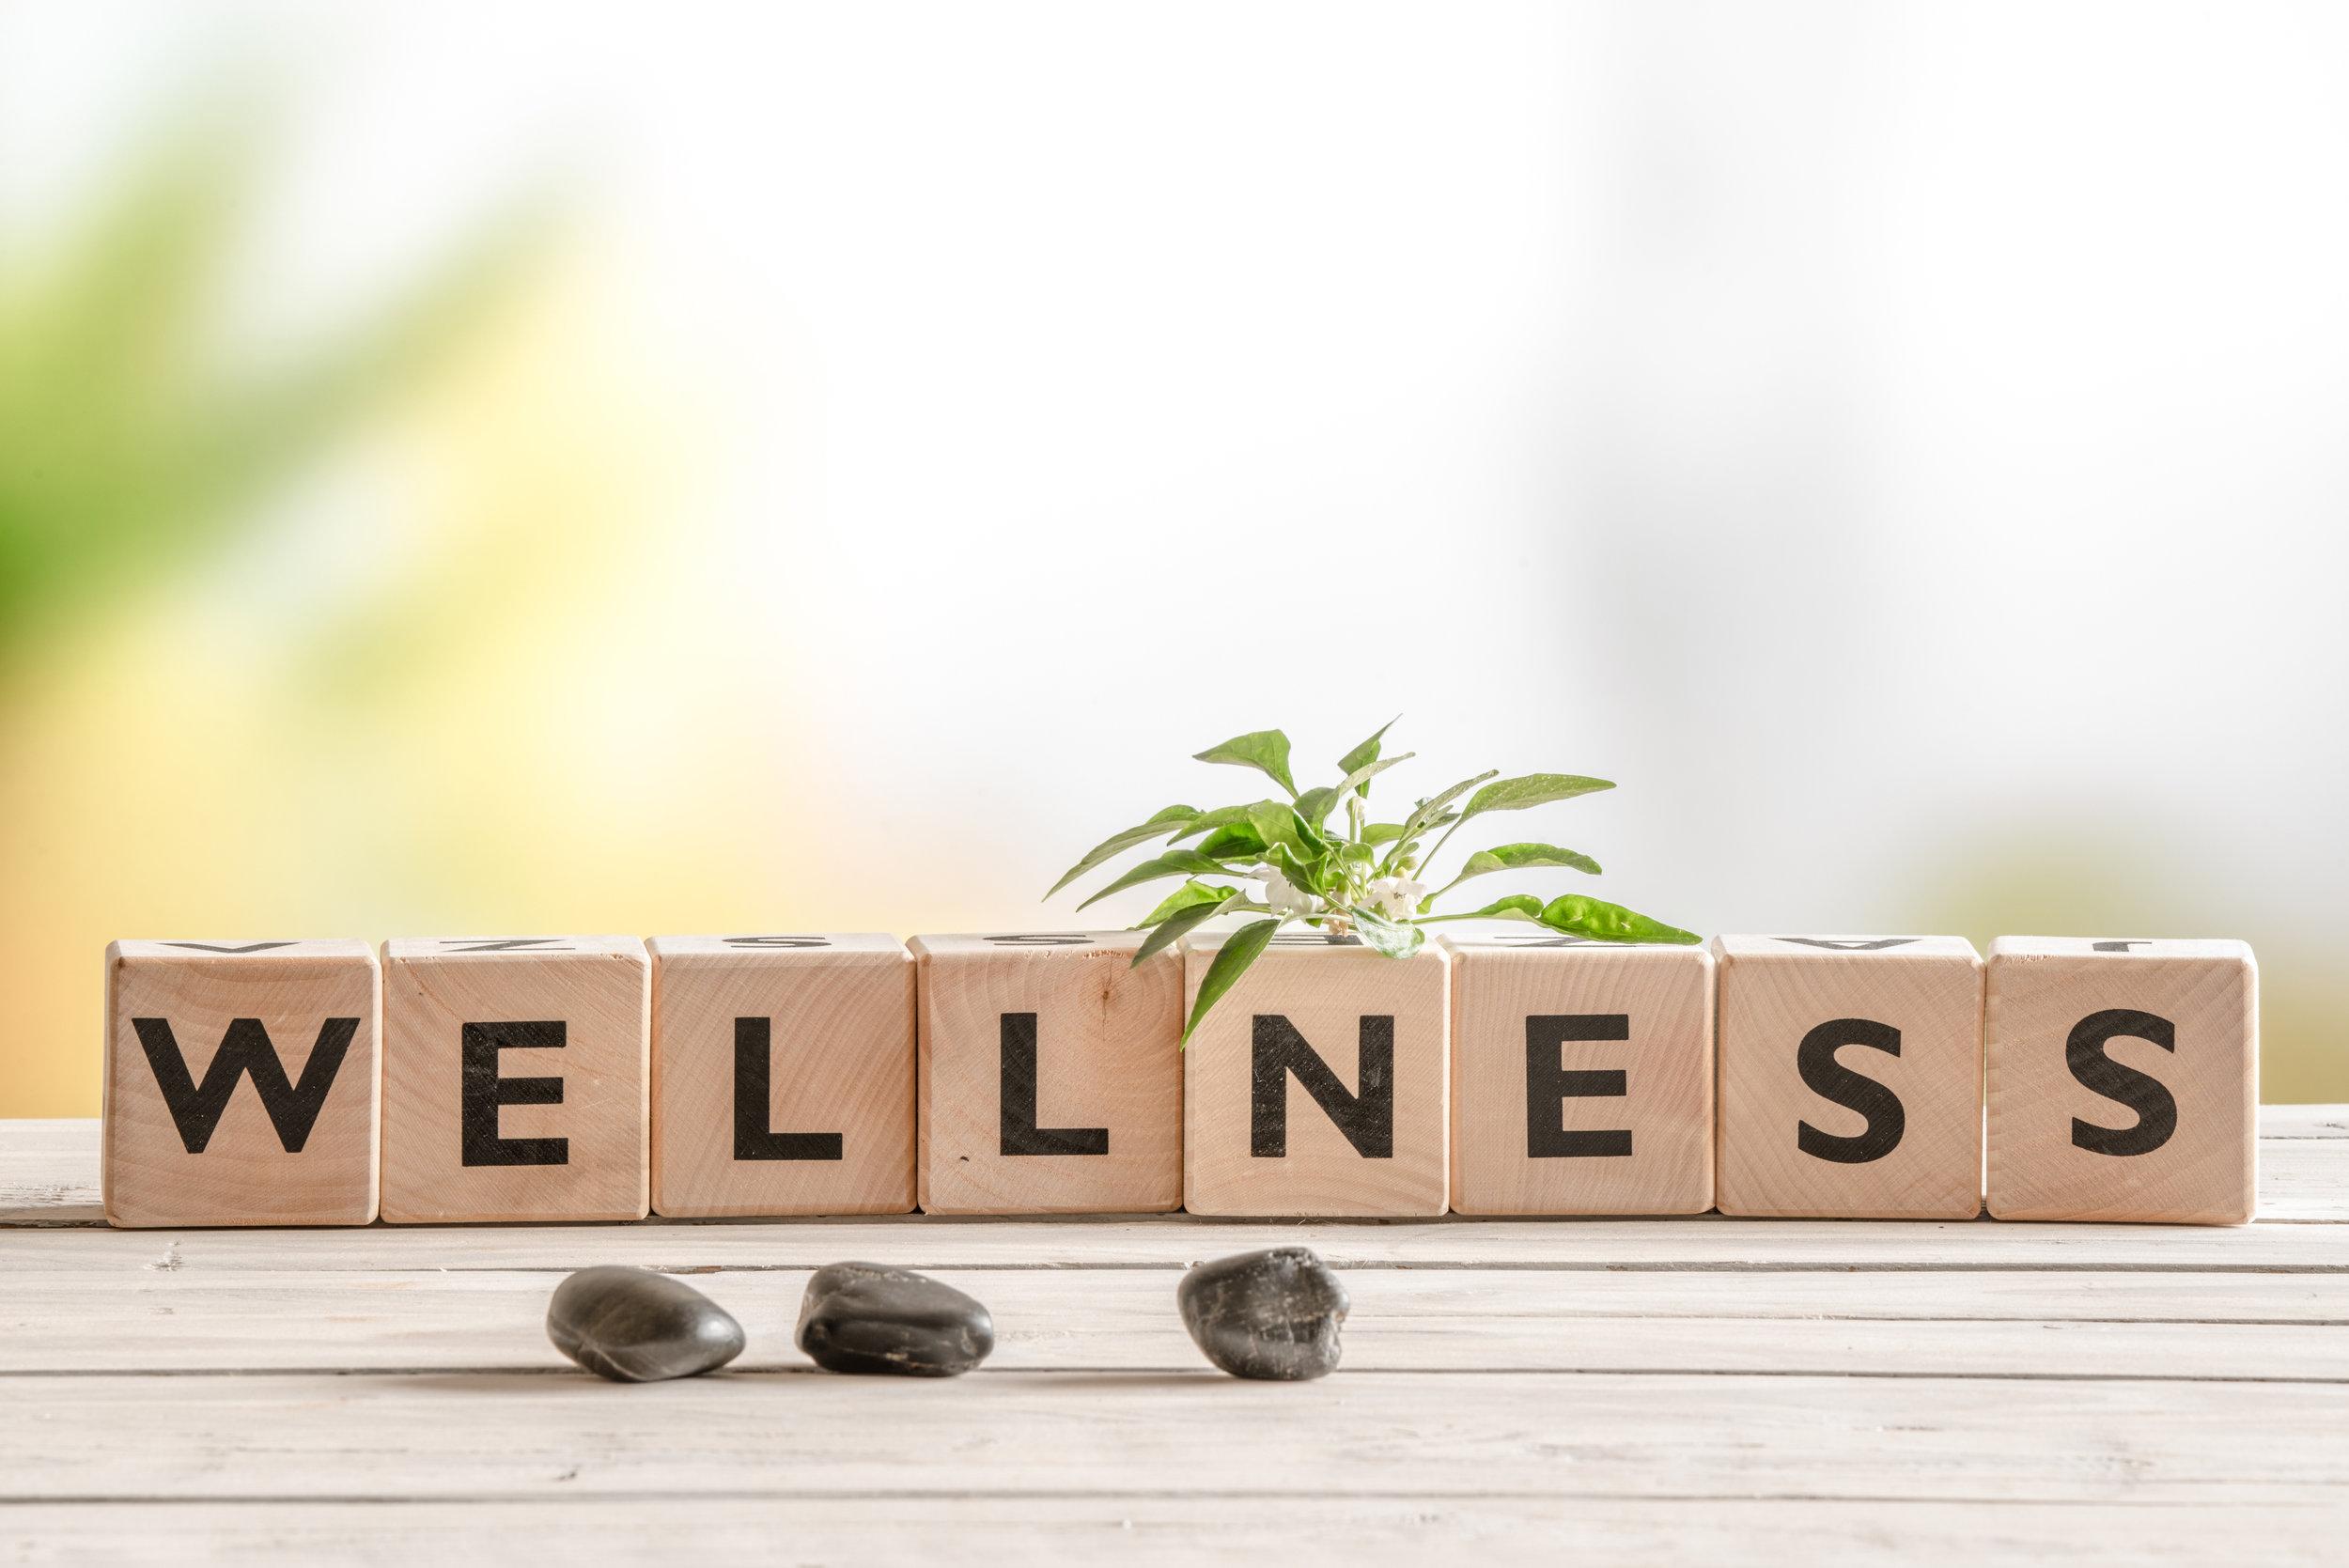 wellnessblocks.jpg